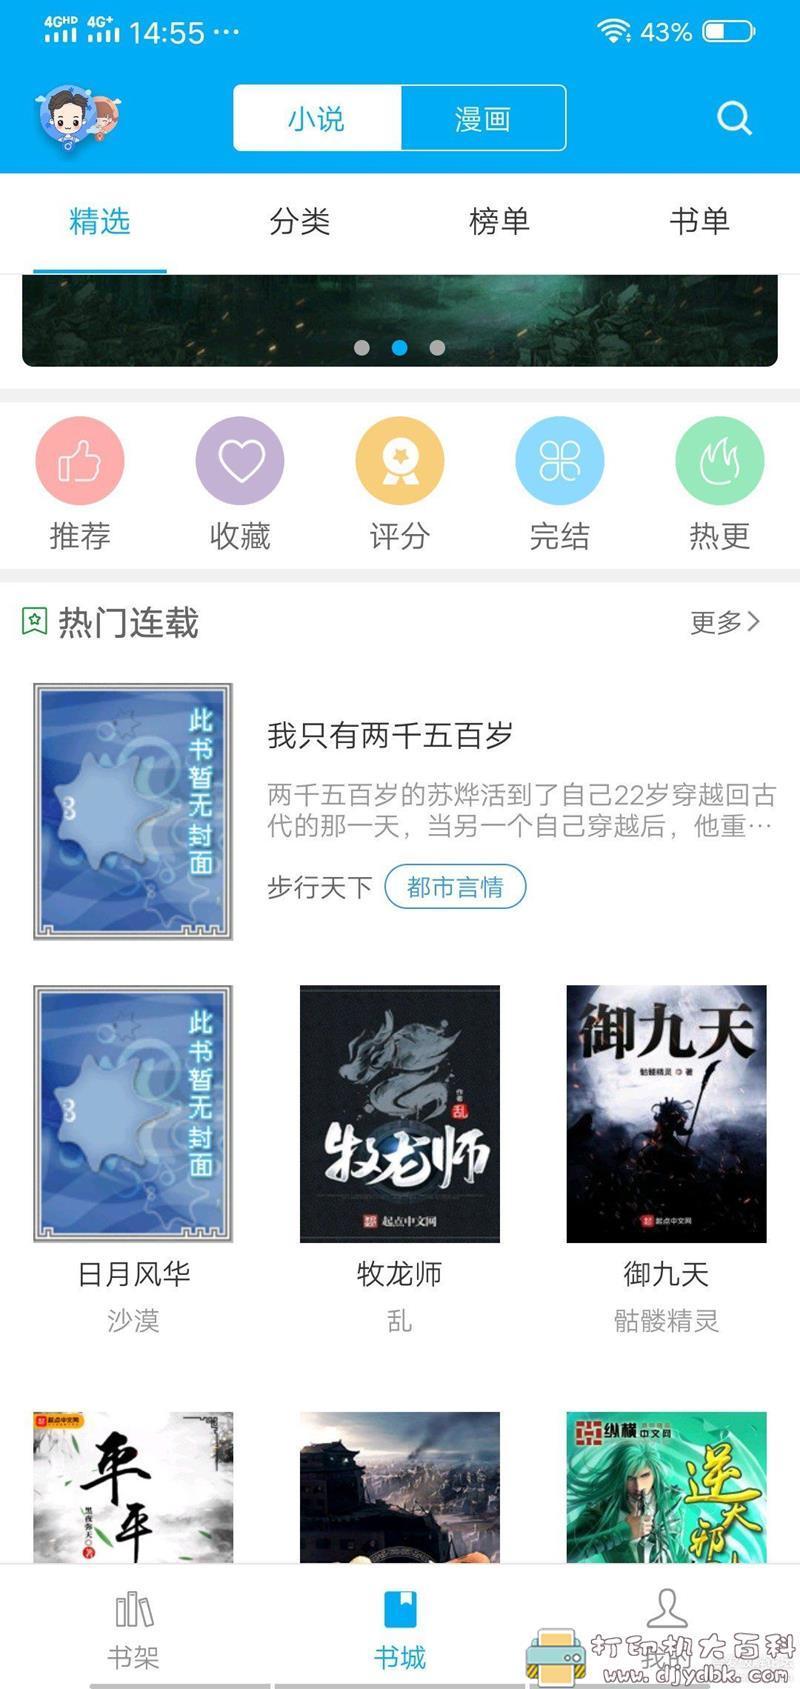 [Android]优秀的小说软件 笔趣阁 V8.0图片 No.3